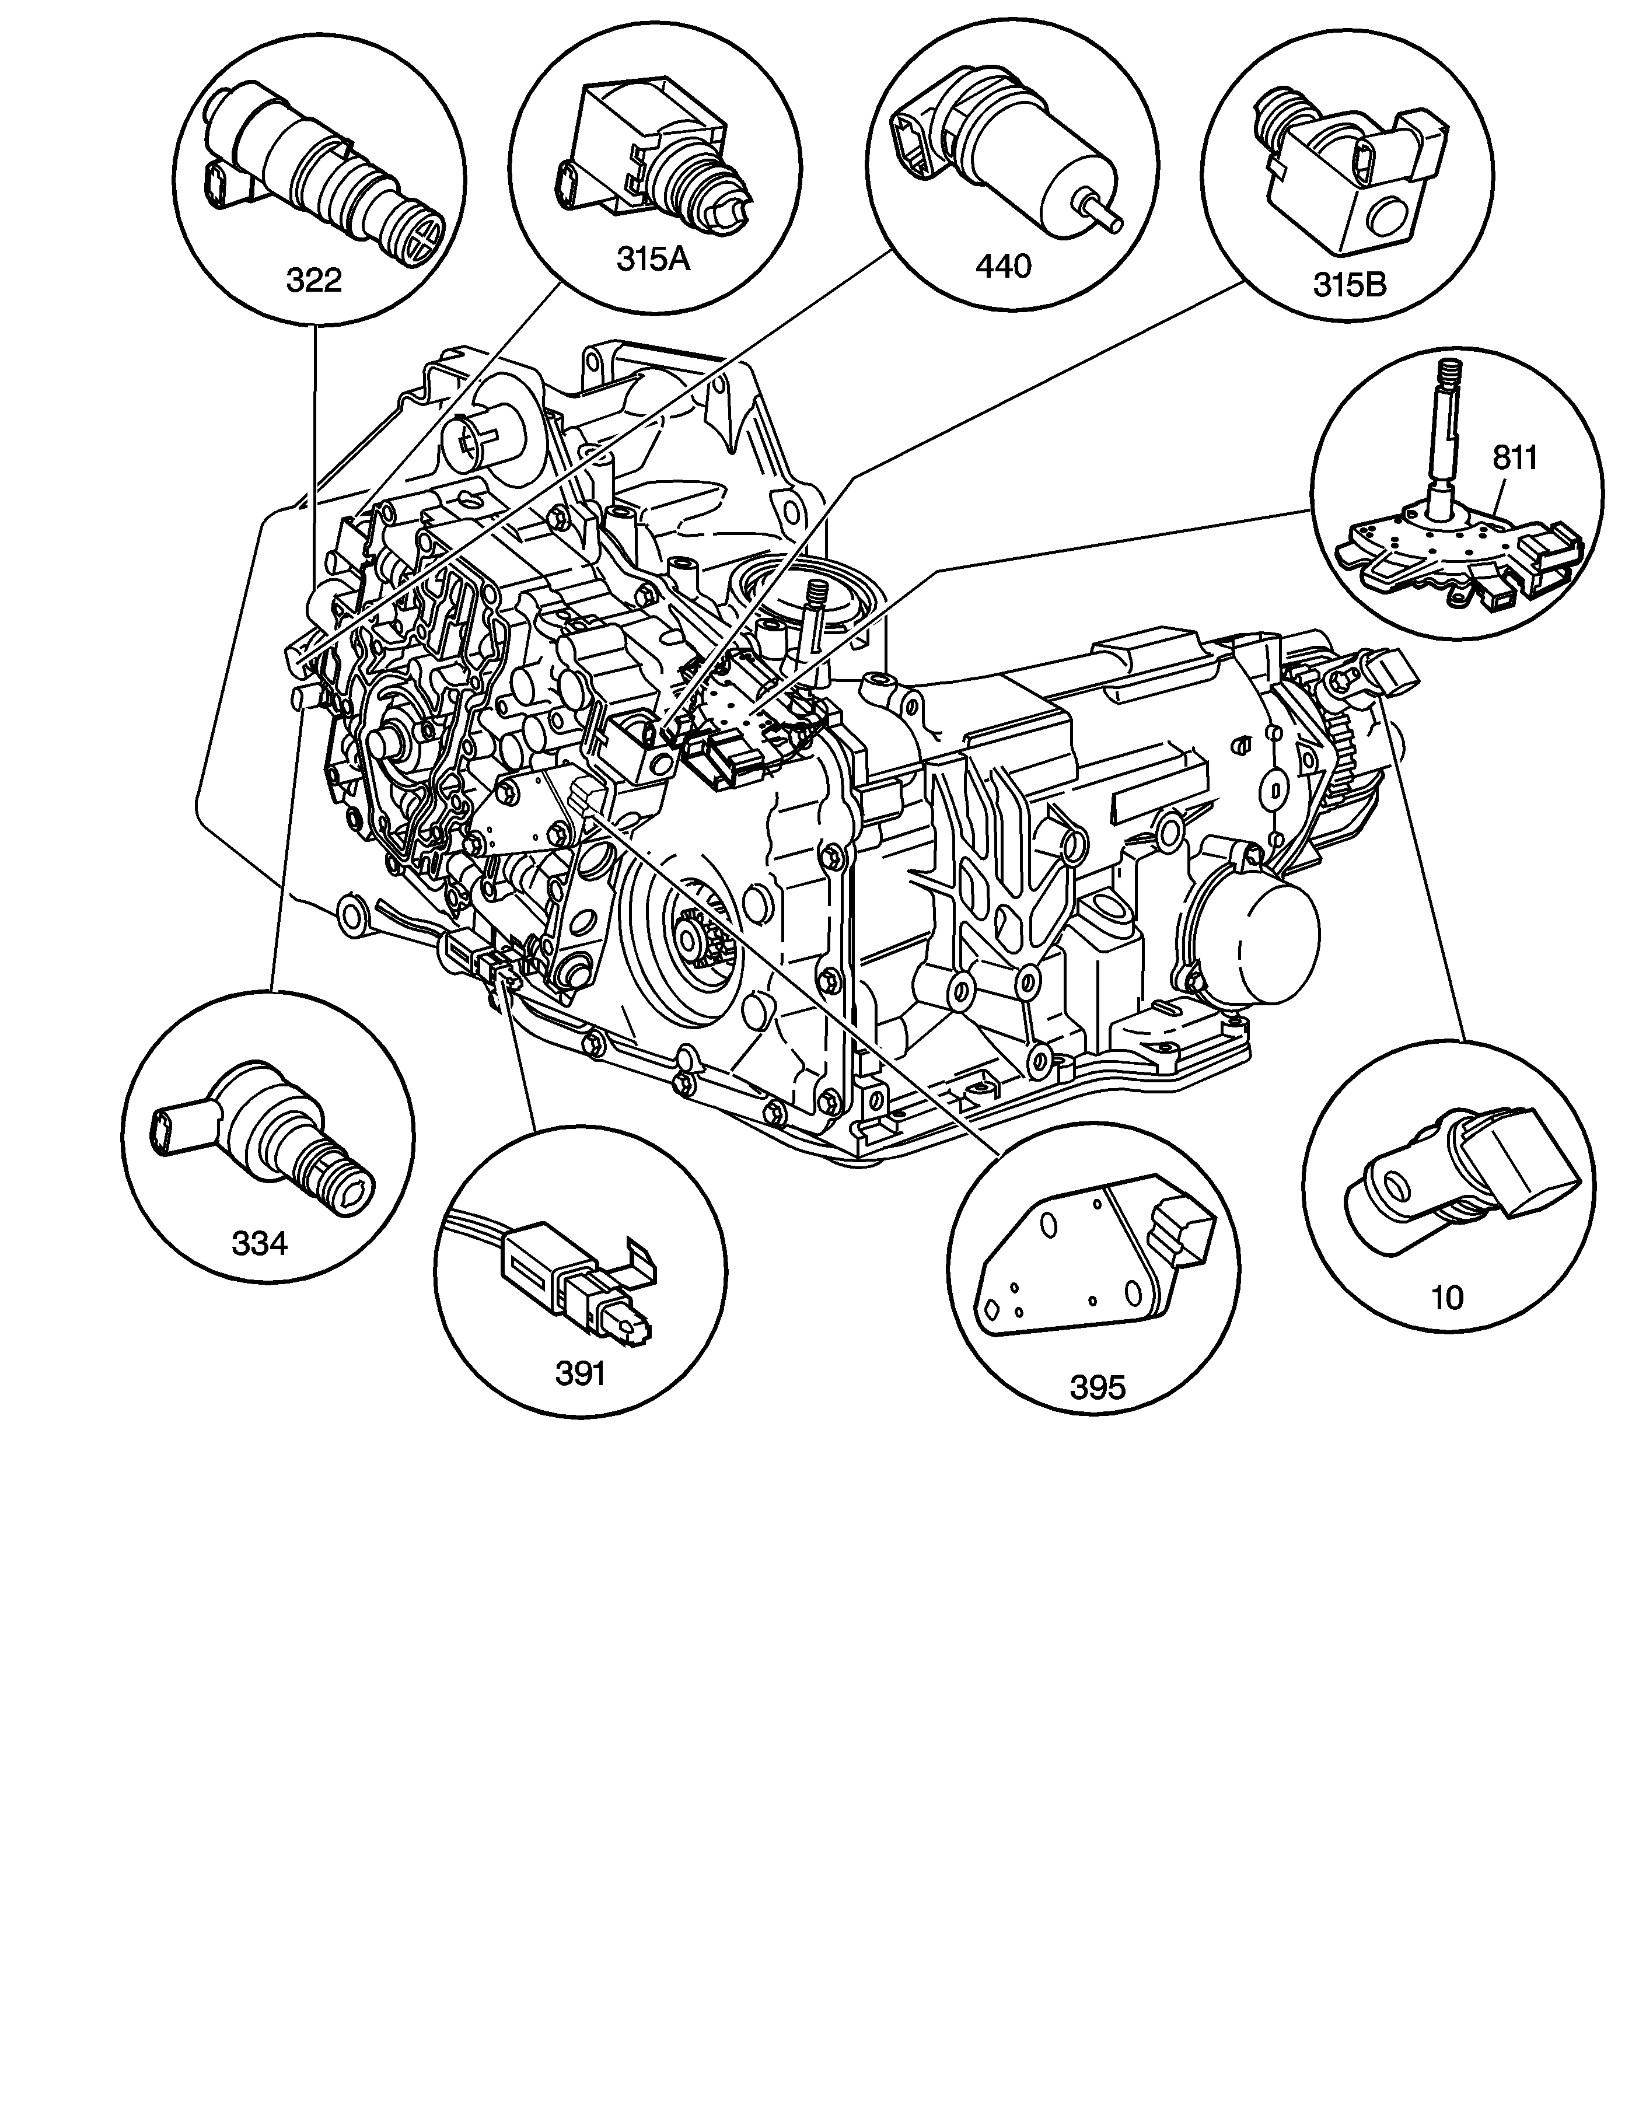 Pontiac Engine Diagram Wiring Diagram Datawiring Datawiring Zaafran It